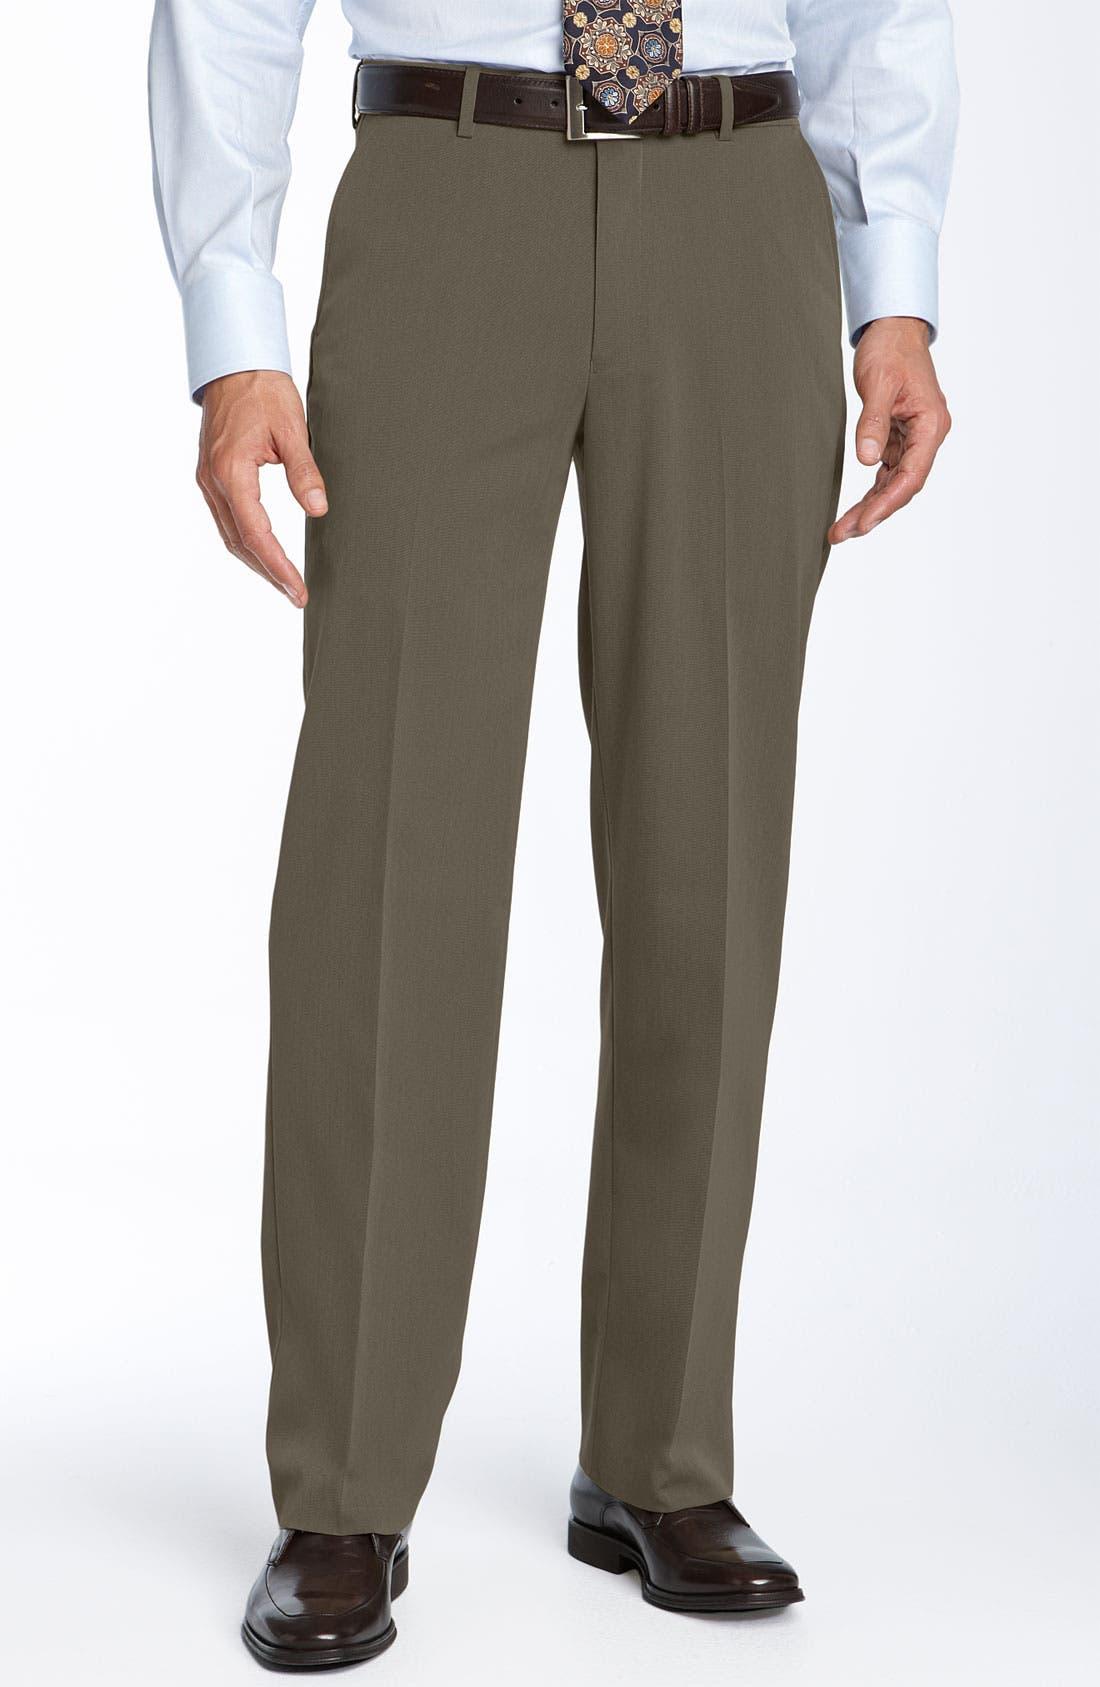 Alternate Image 1 Selected - Ballin Comfort EZE Flat Front Trousers